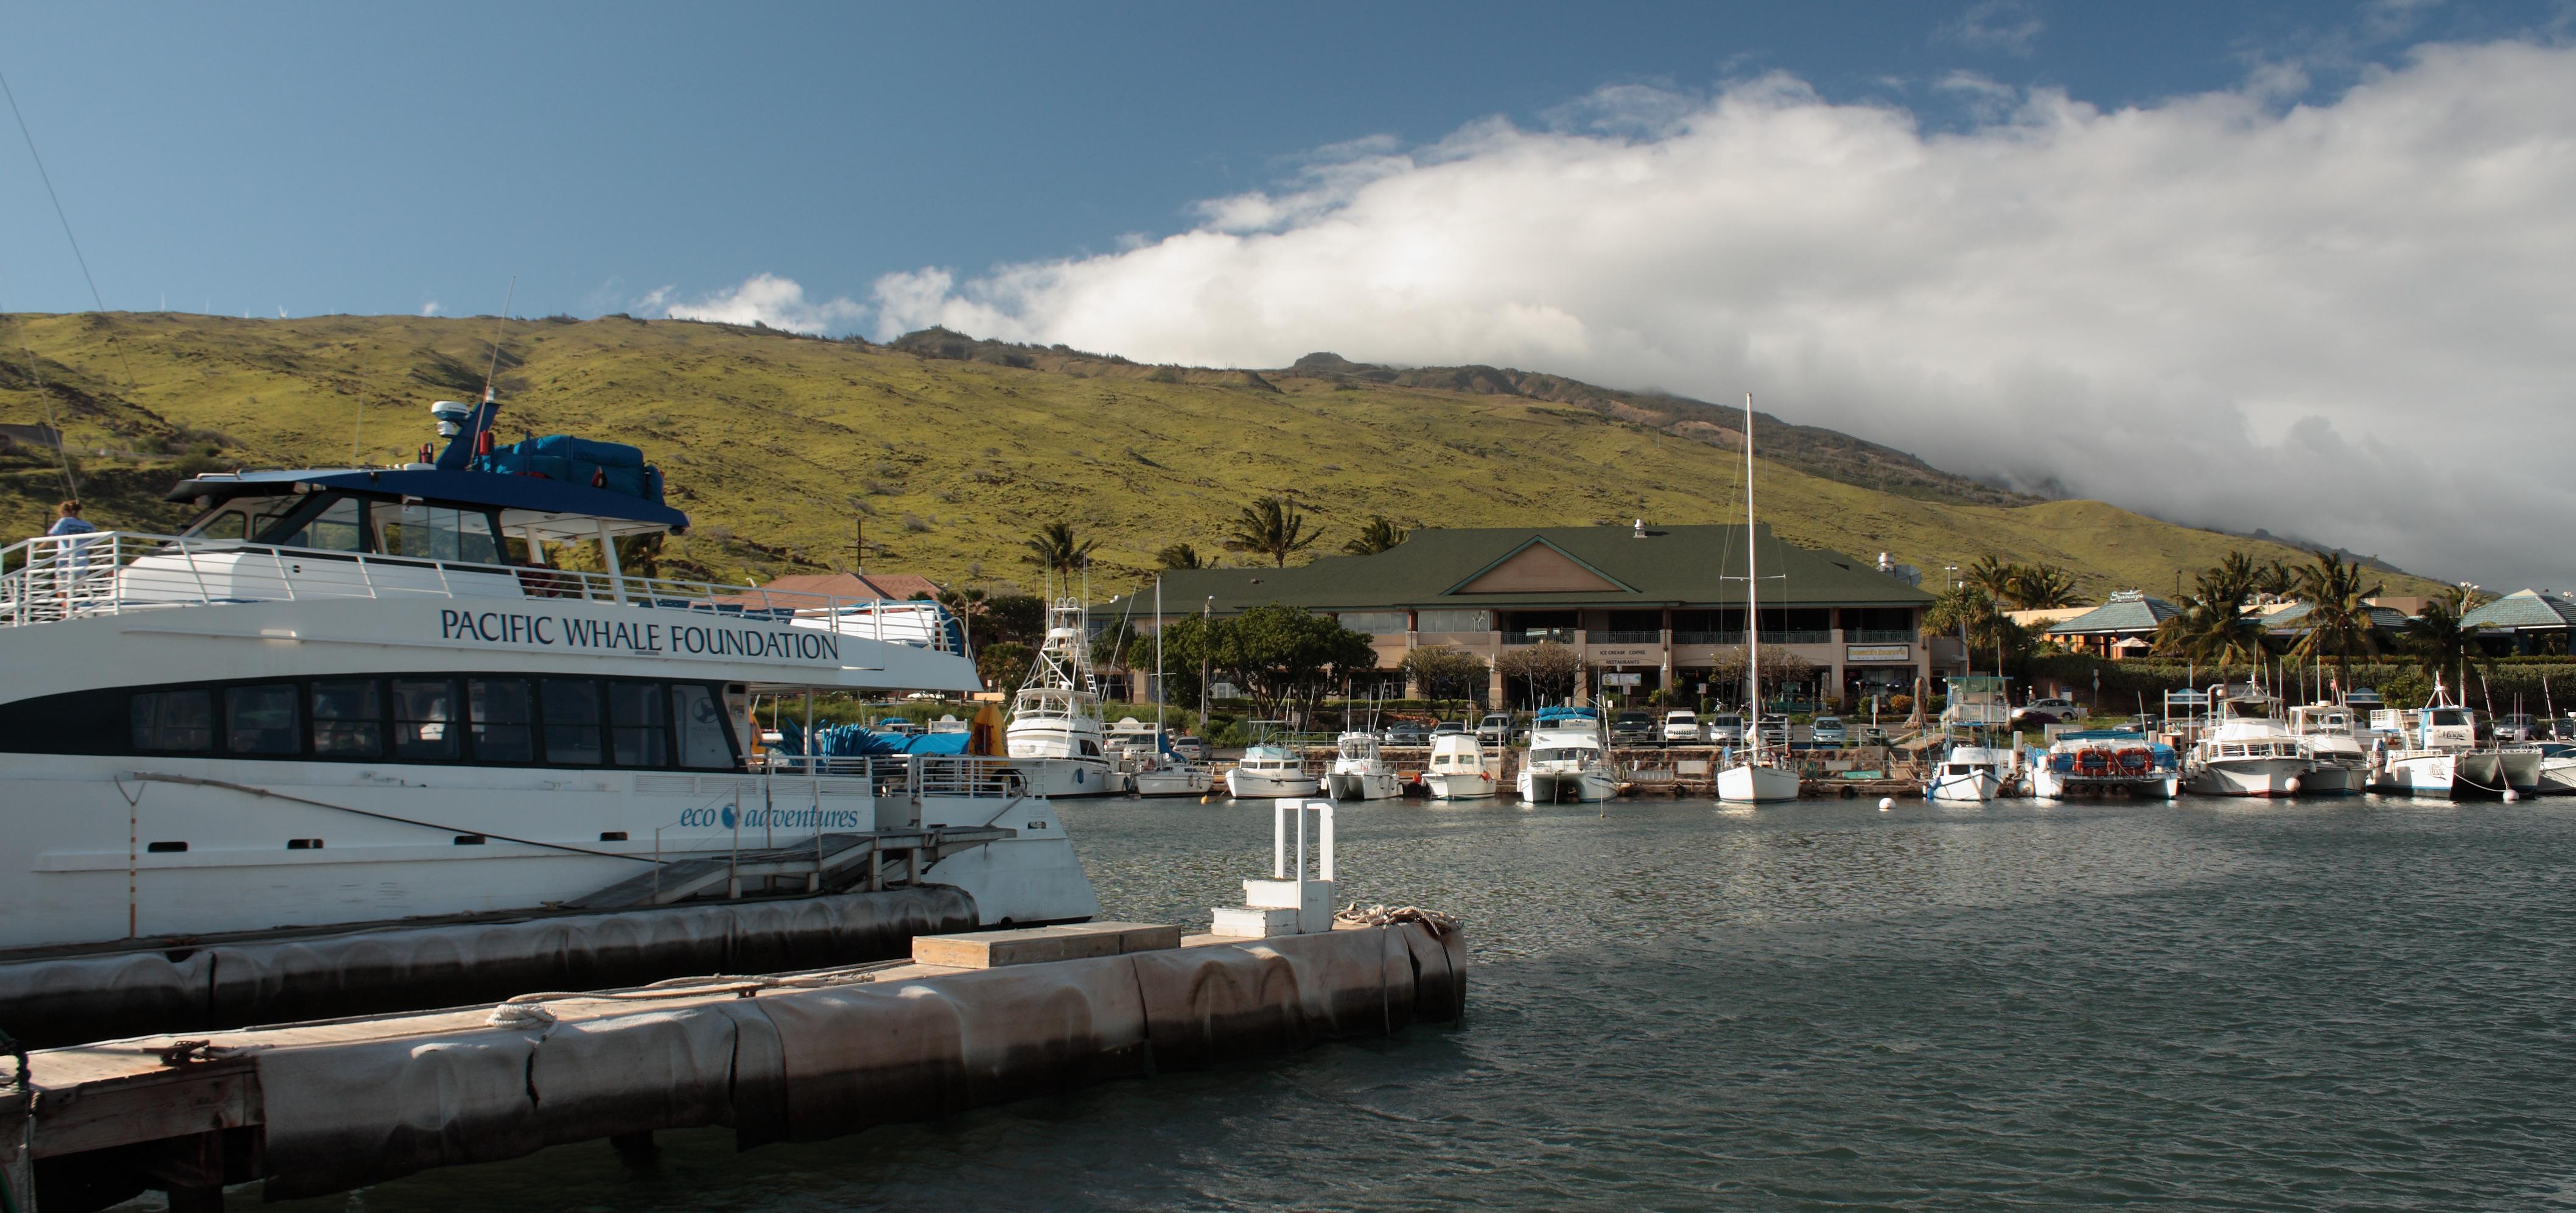 Photo source: wikimedia.org/wikipedia/commons/3/3f/Pacific_Whale_Foundation_Maalaea_Harbor.